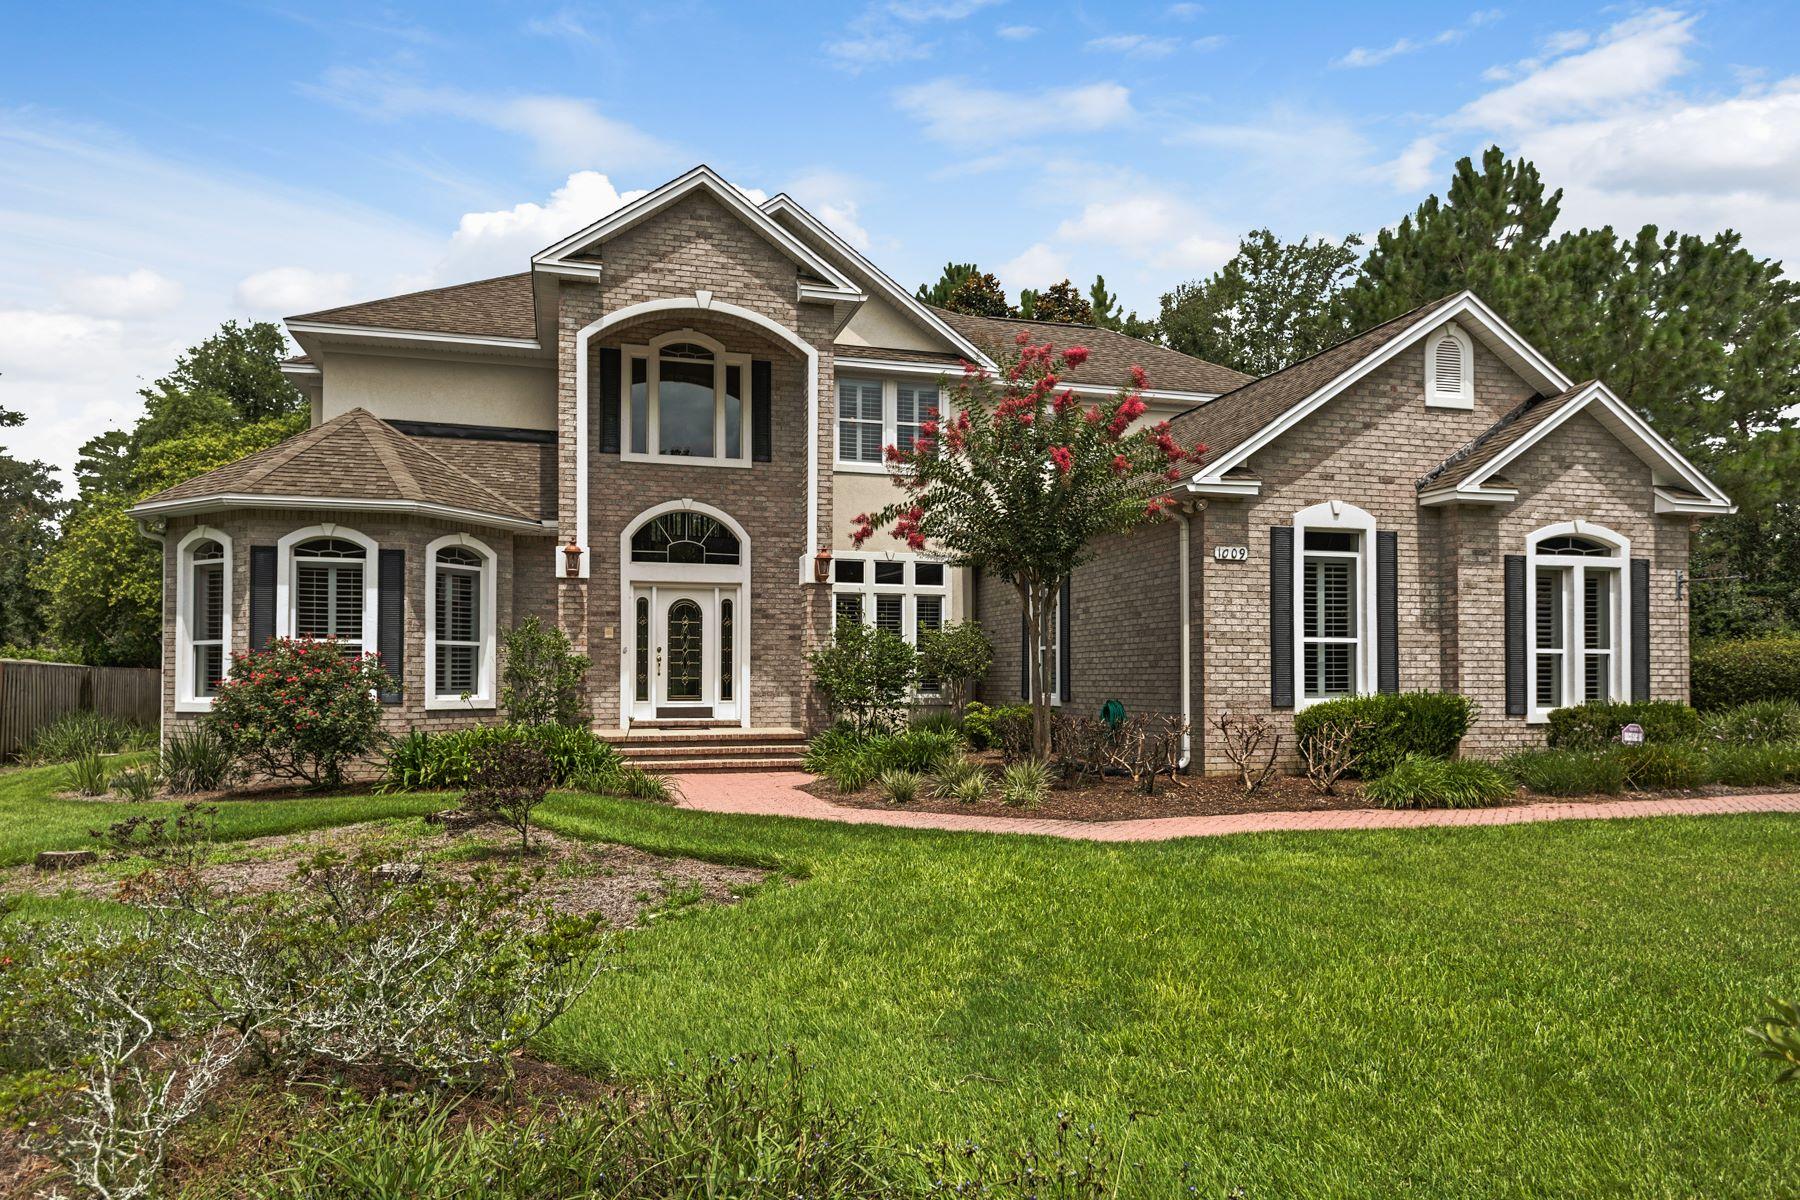 Casa Unifamiliar por un Venta en SPACIOUS AND THOUGHTFULLY DESIGNED HOME WITH AMENITIES 1009 Crooked Creek Cove Niceville, Florida, 32578 Estados Unidos